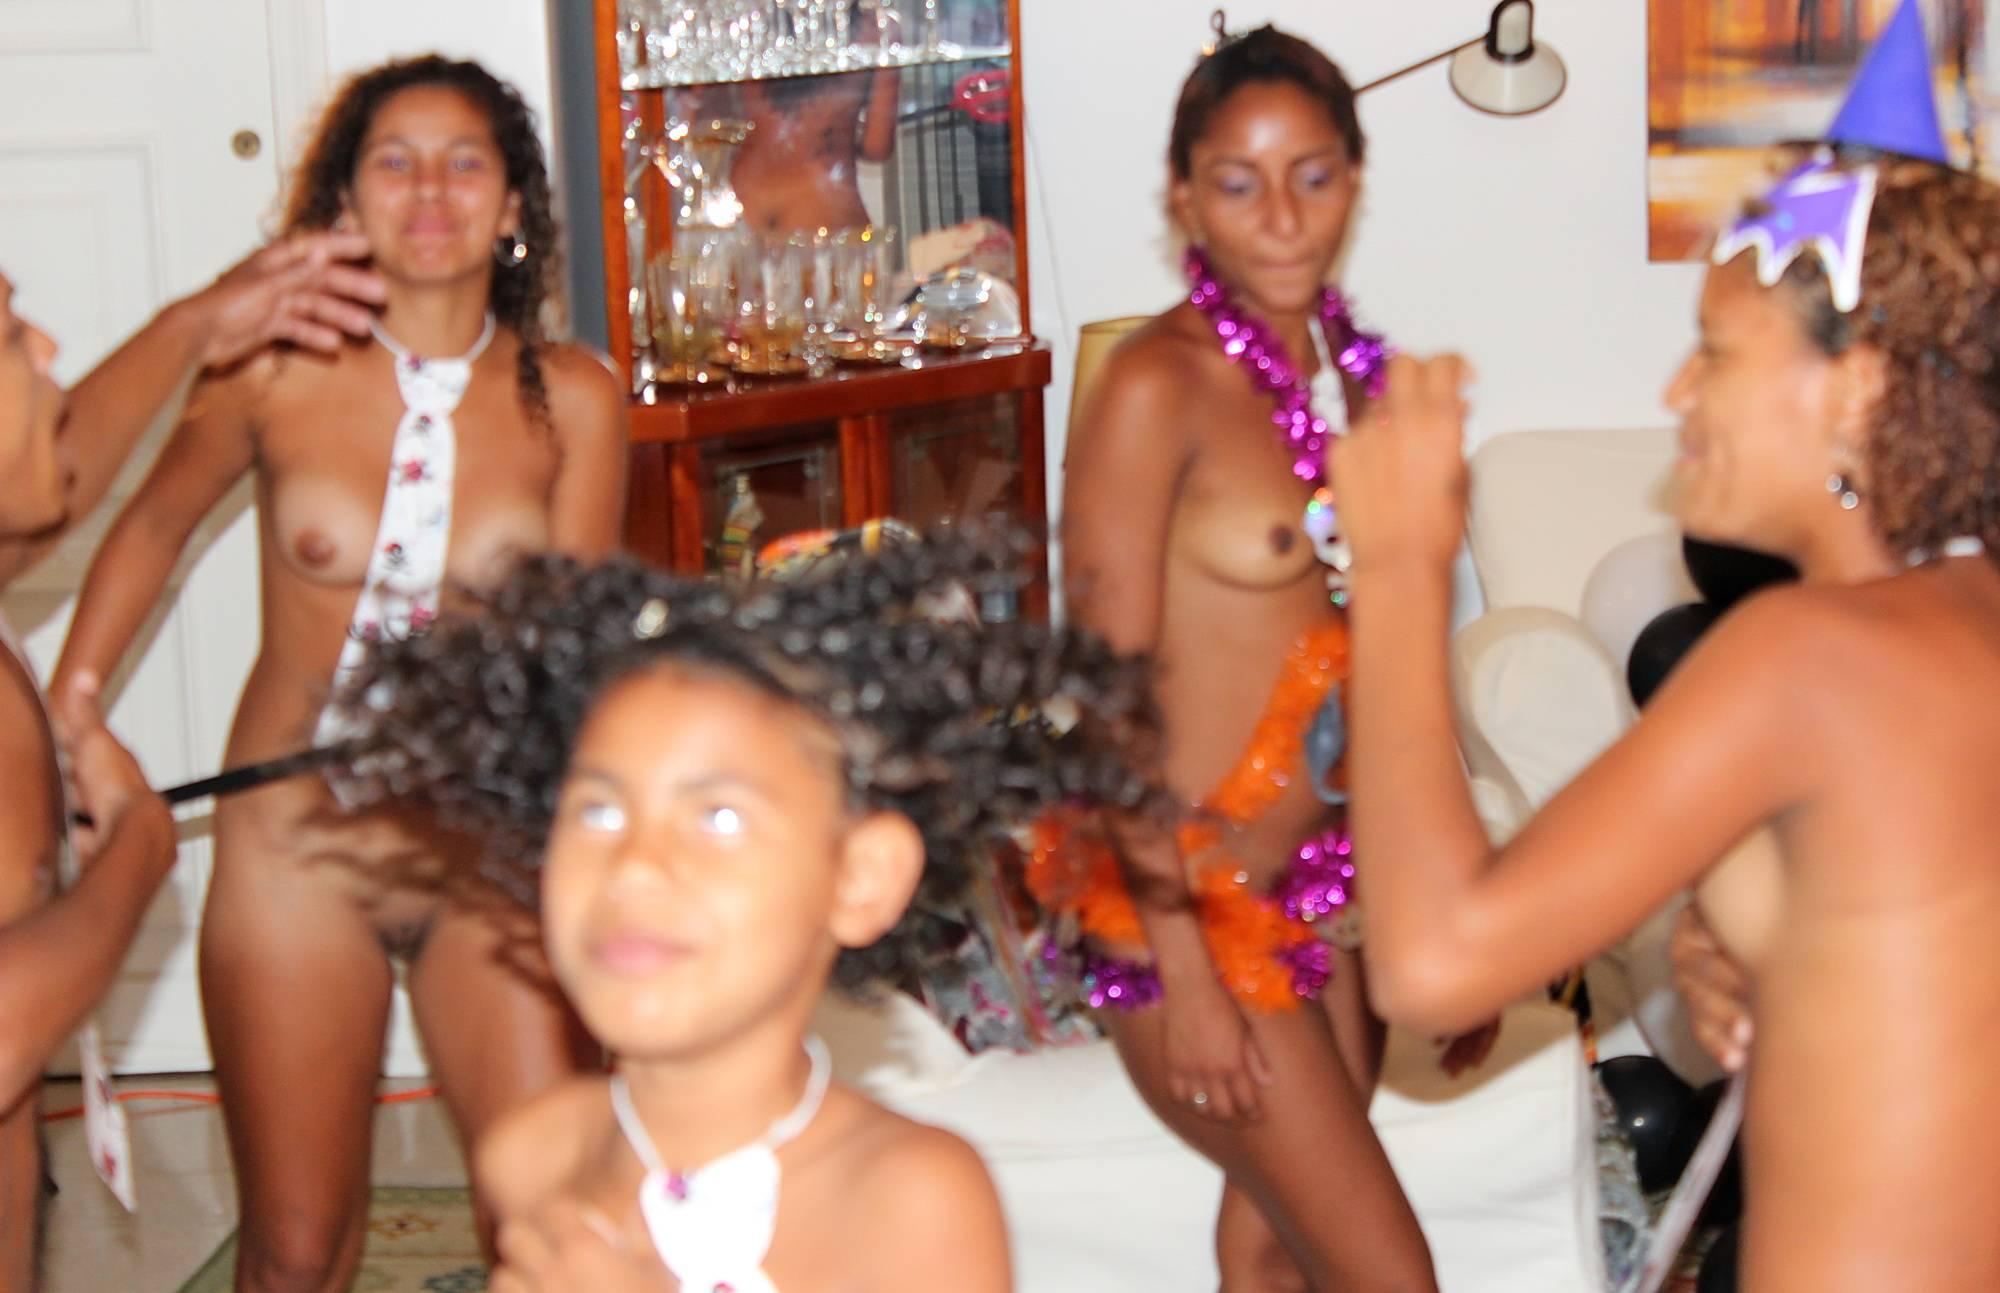 Nudist Pics Dance Dance Revolution - 2